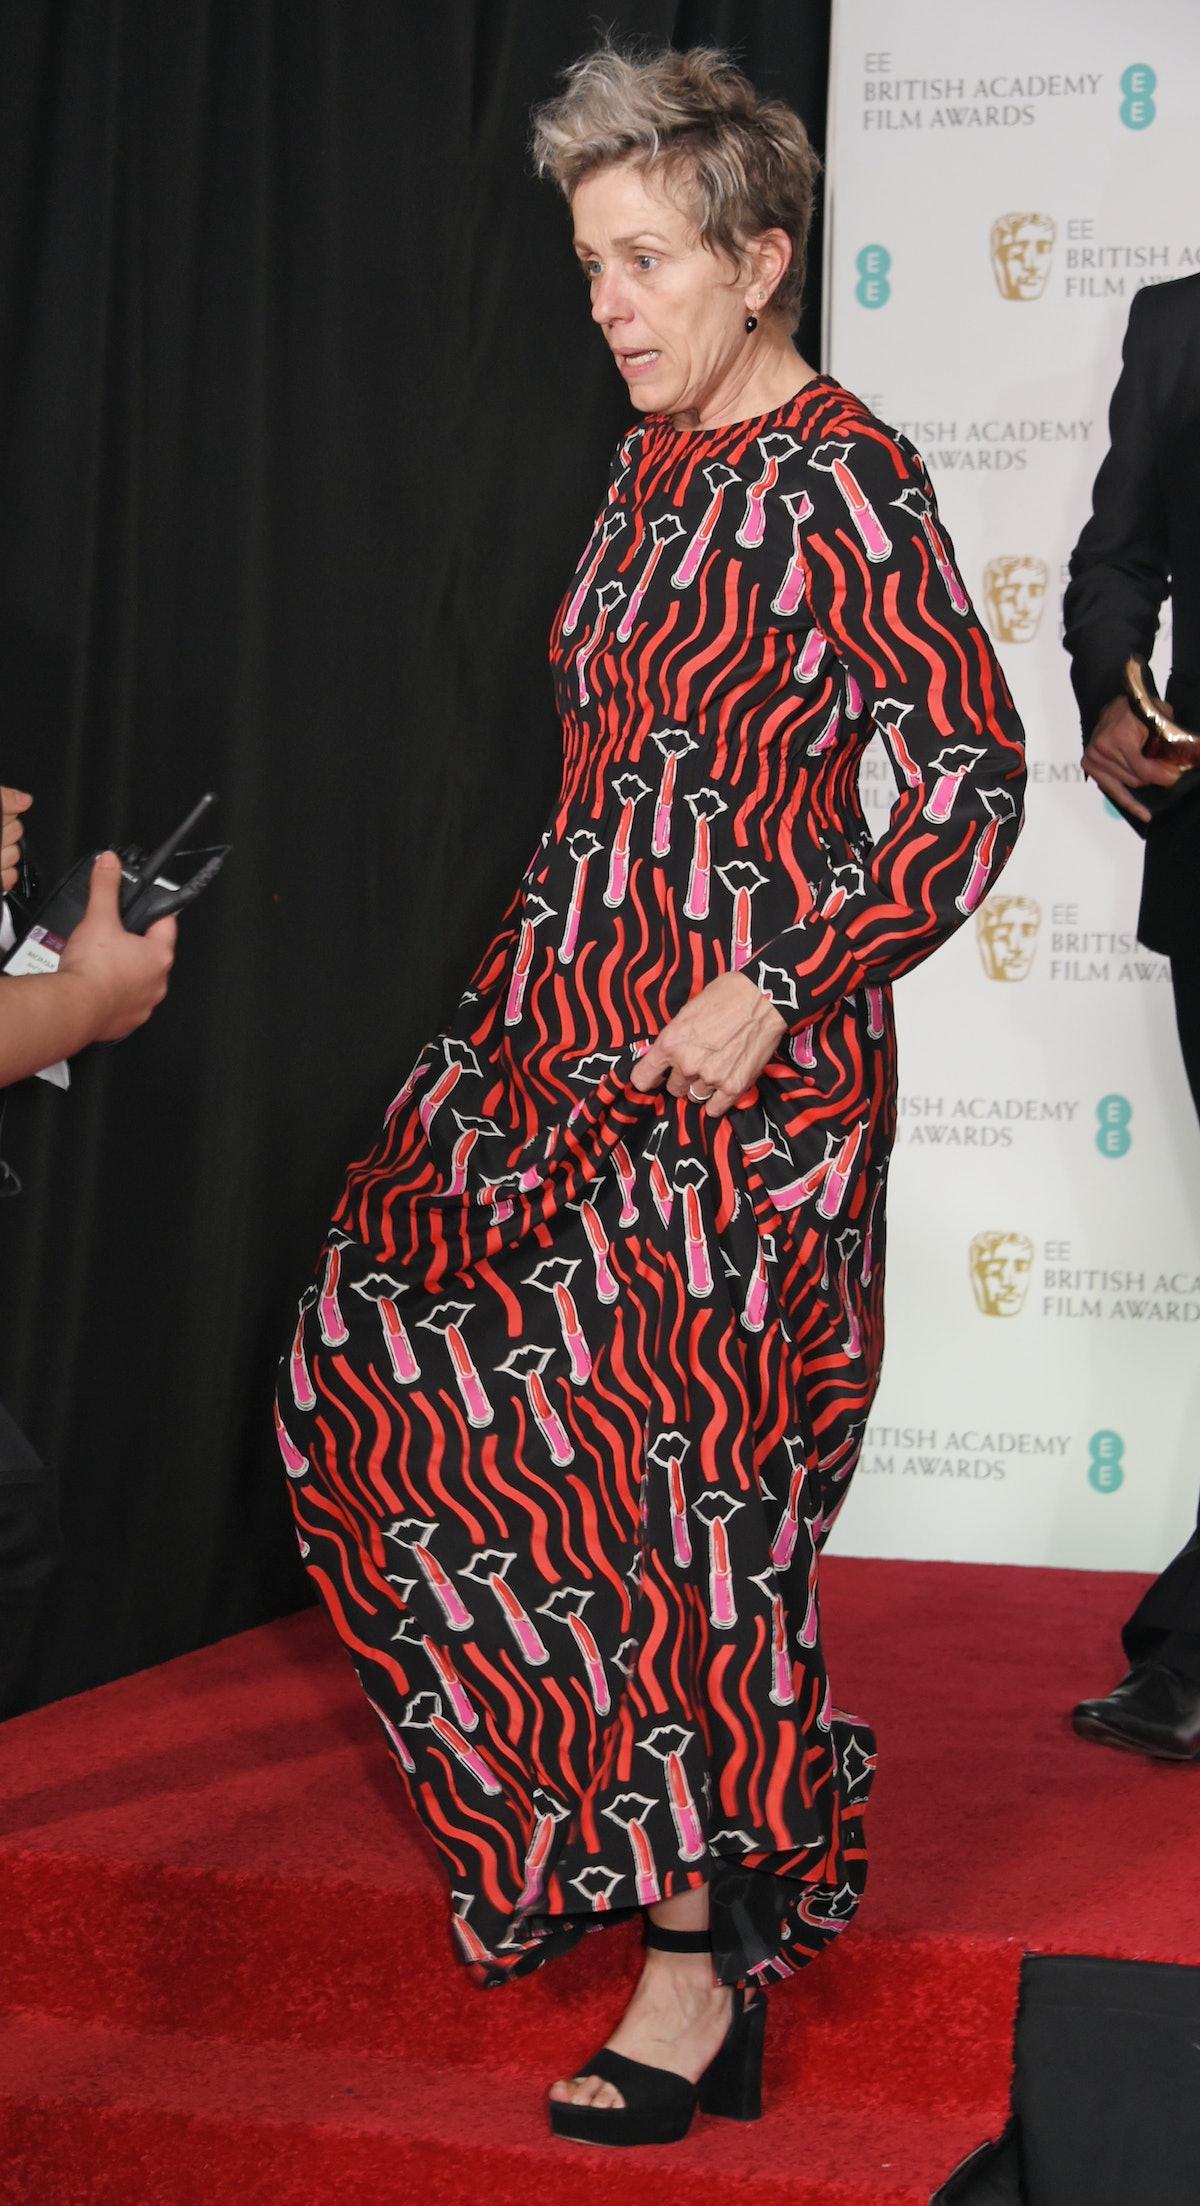 Frances McDormand wearing a patterned dress